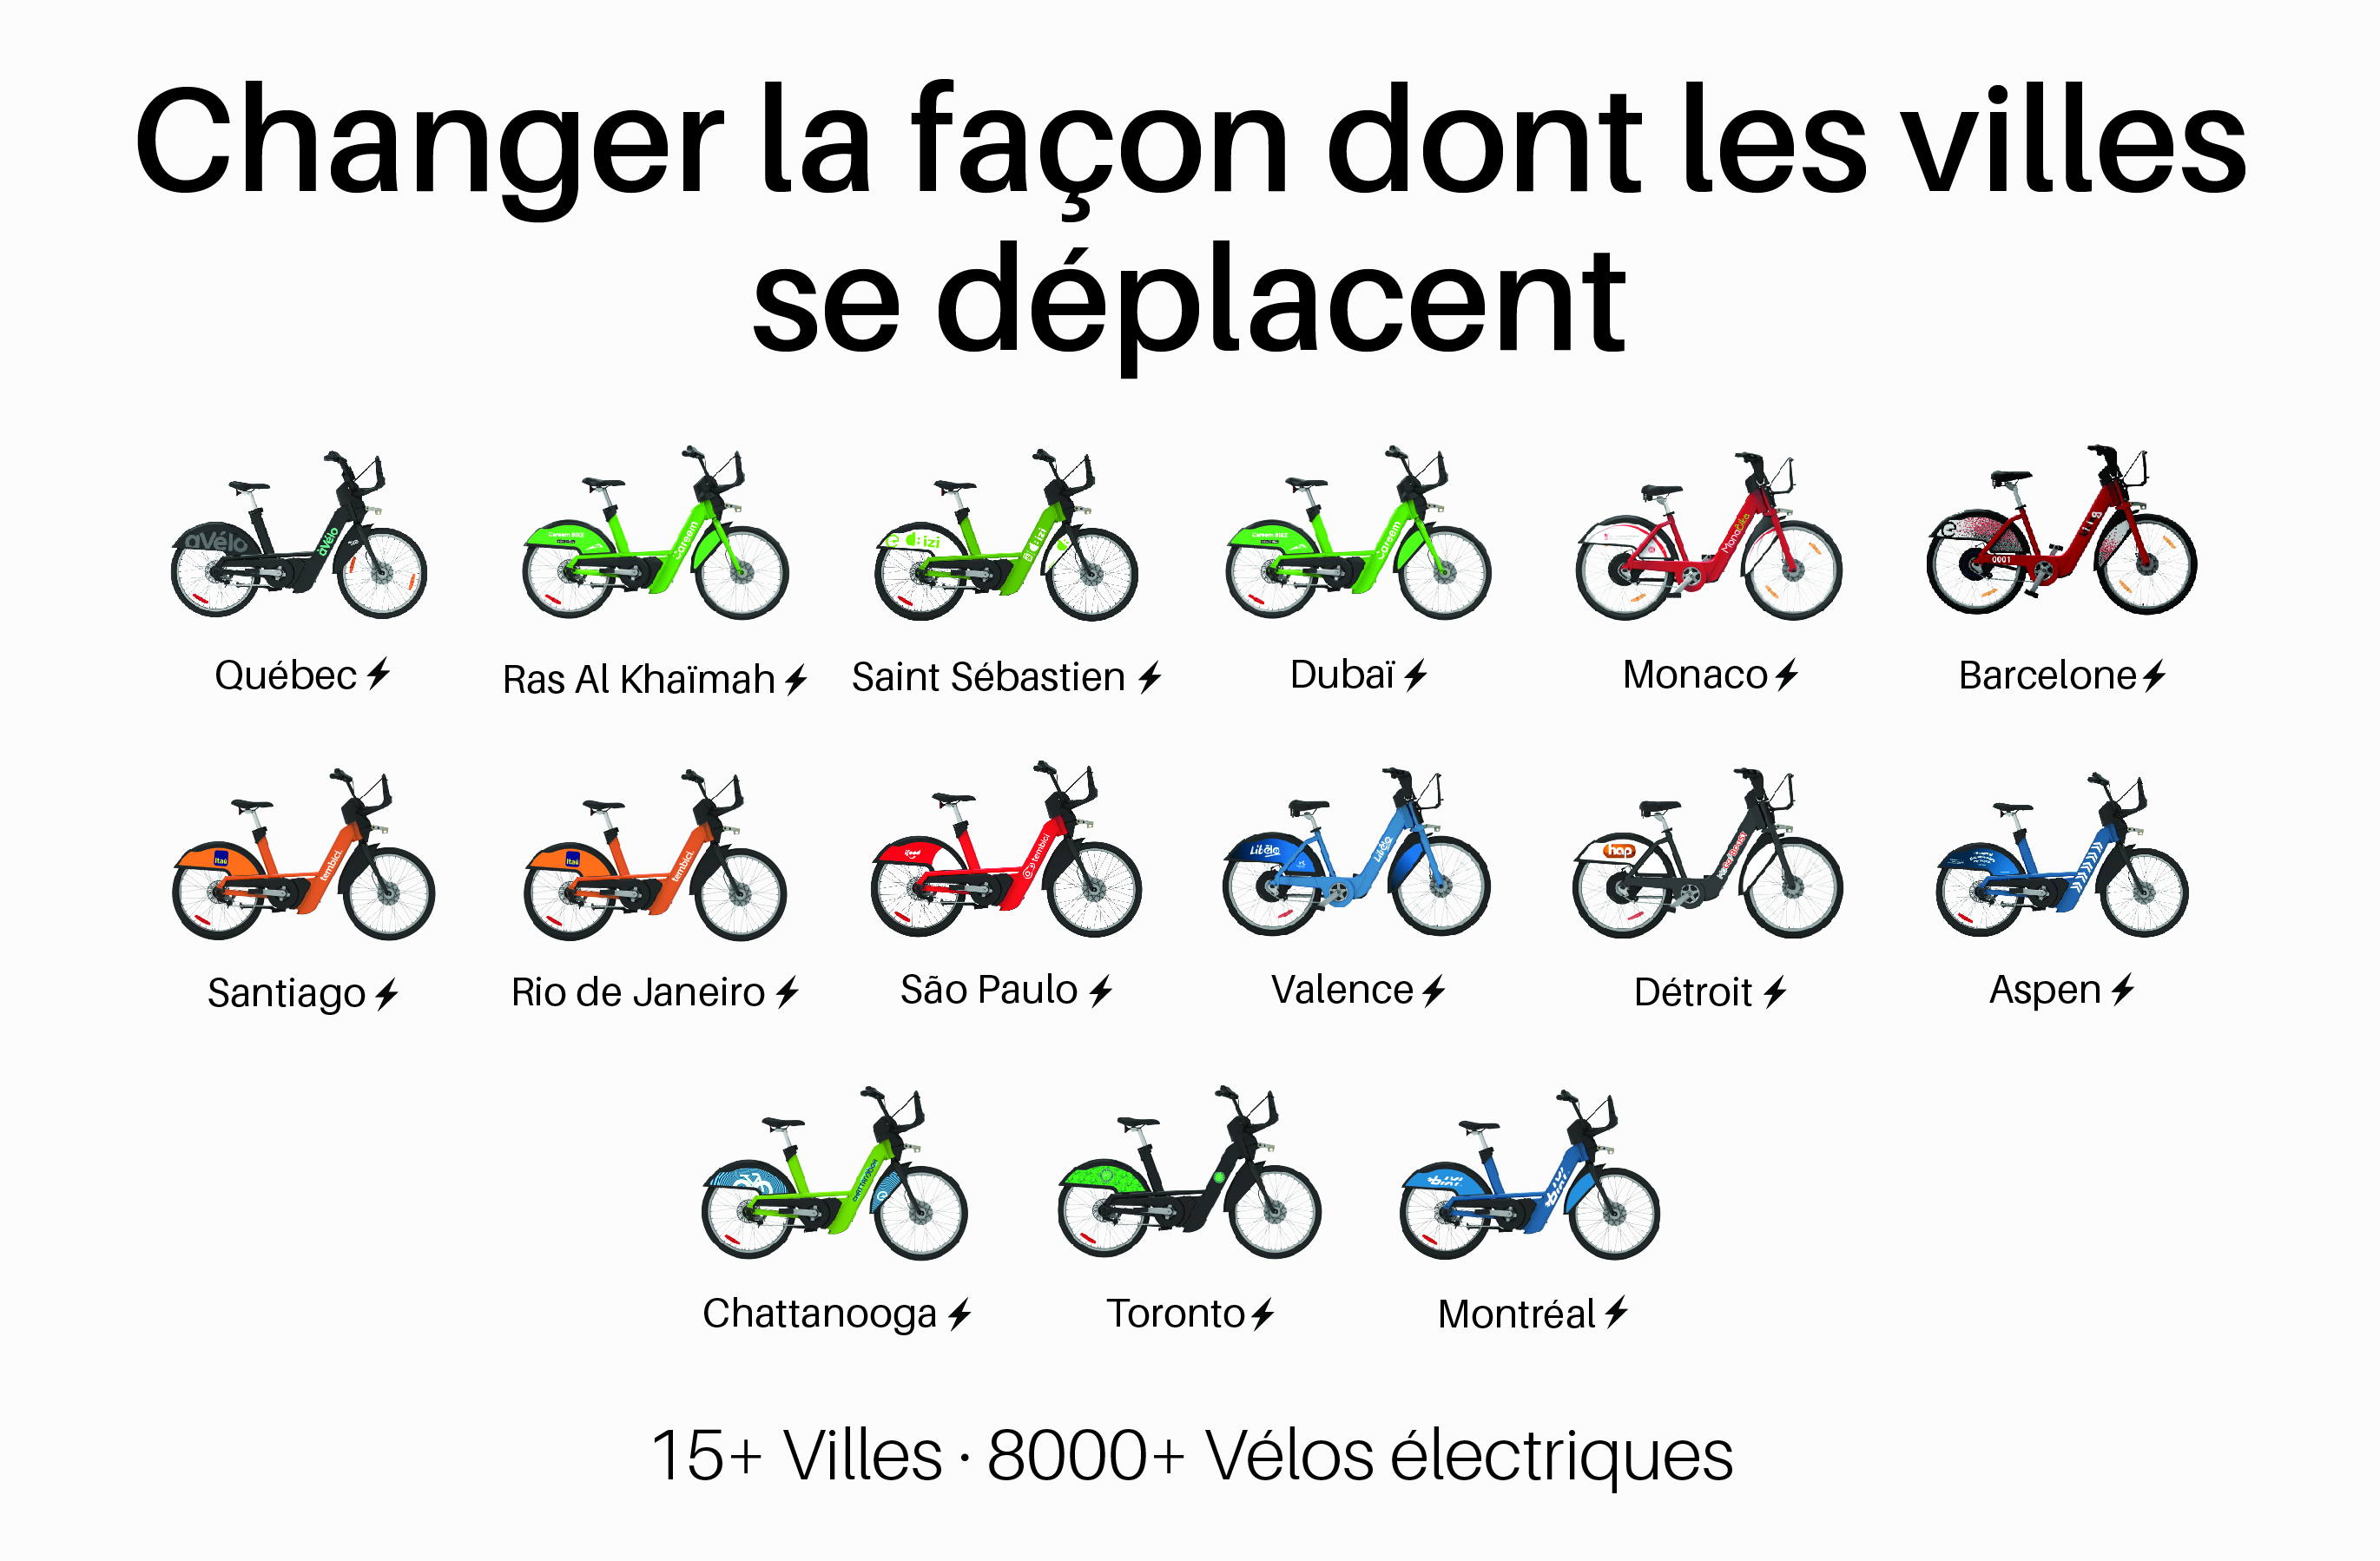 Electric-villes_et_velo_FR-01.jpg (2.69 MB)